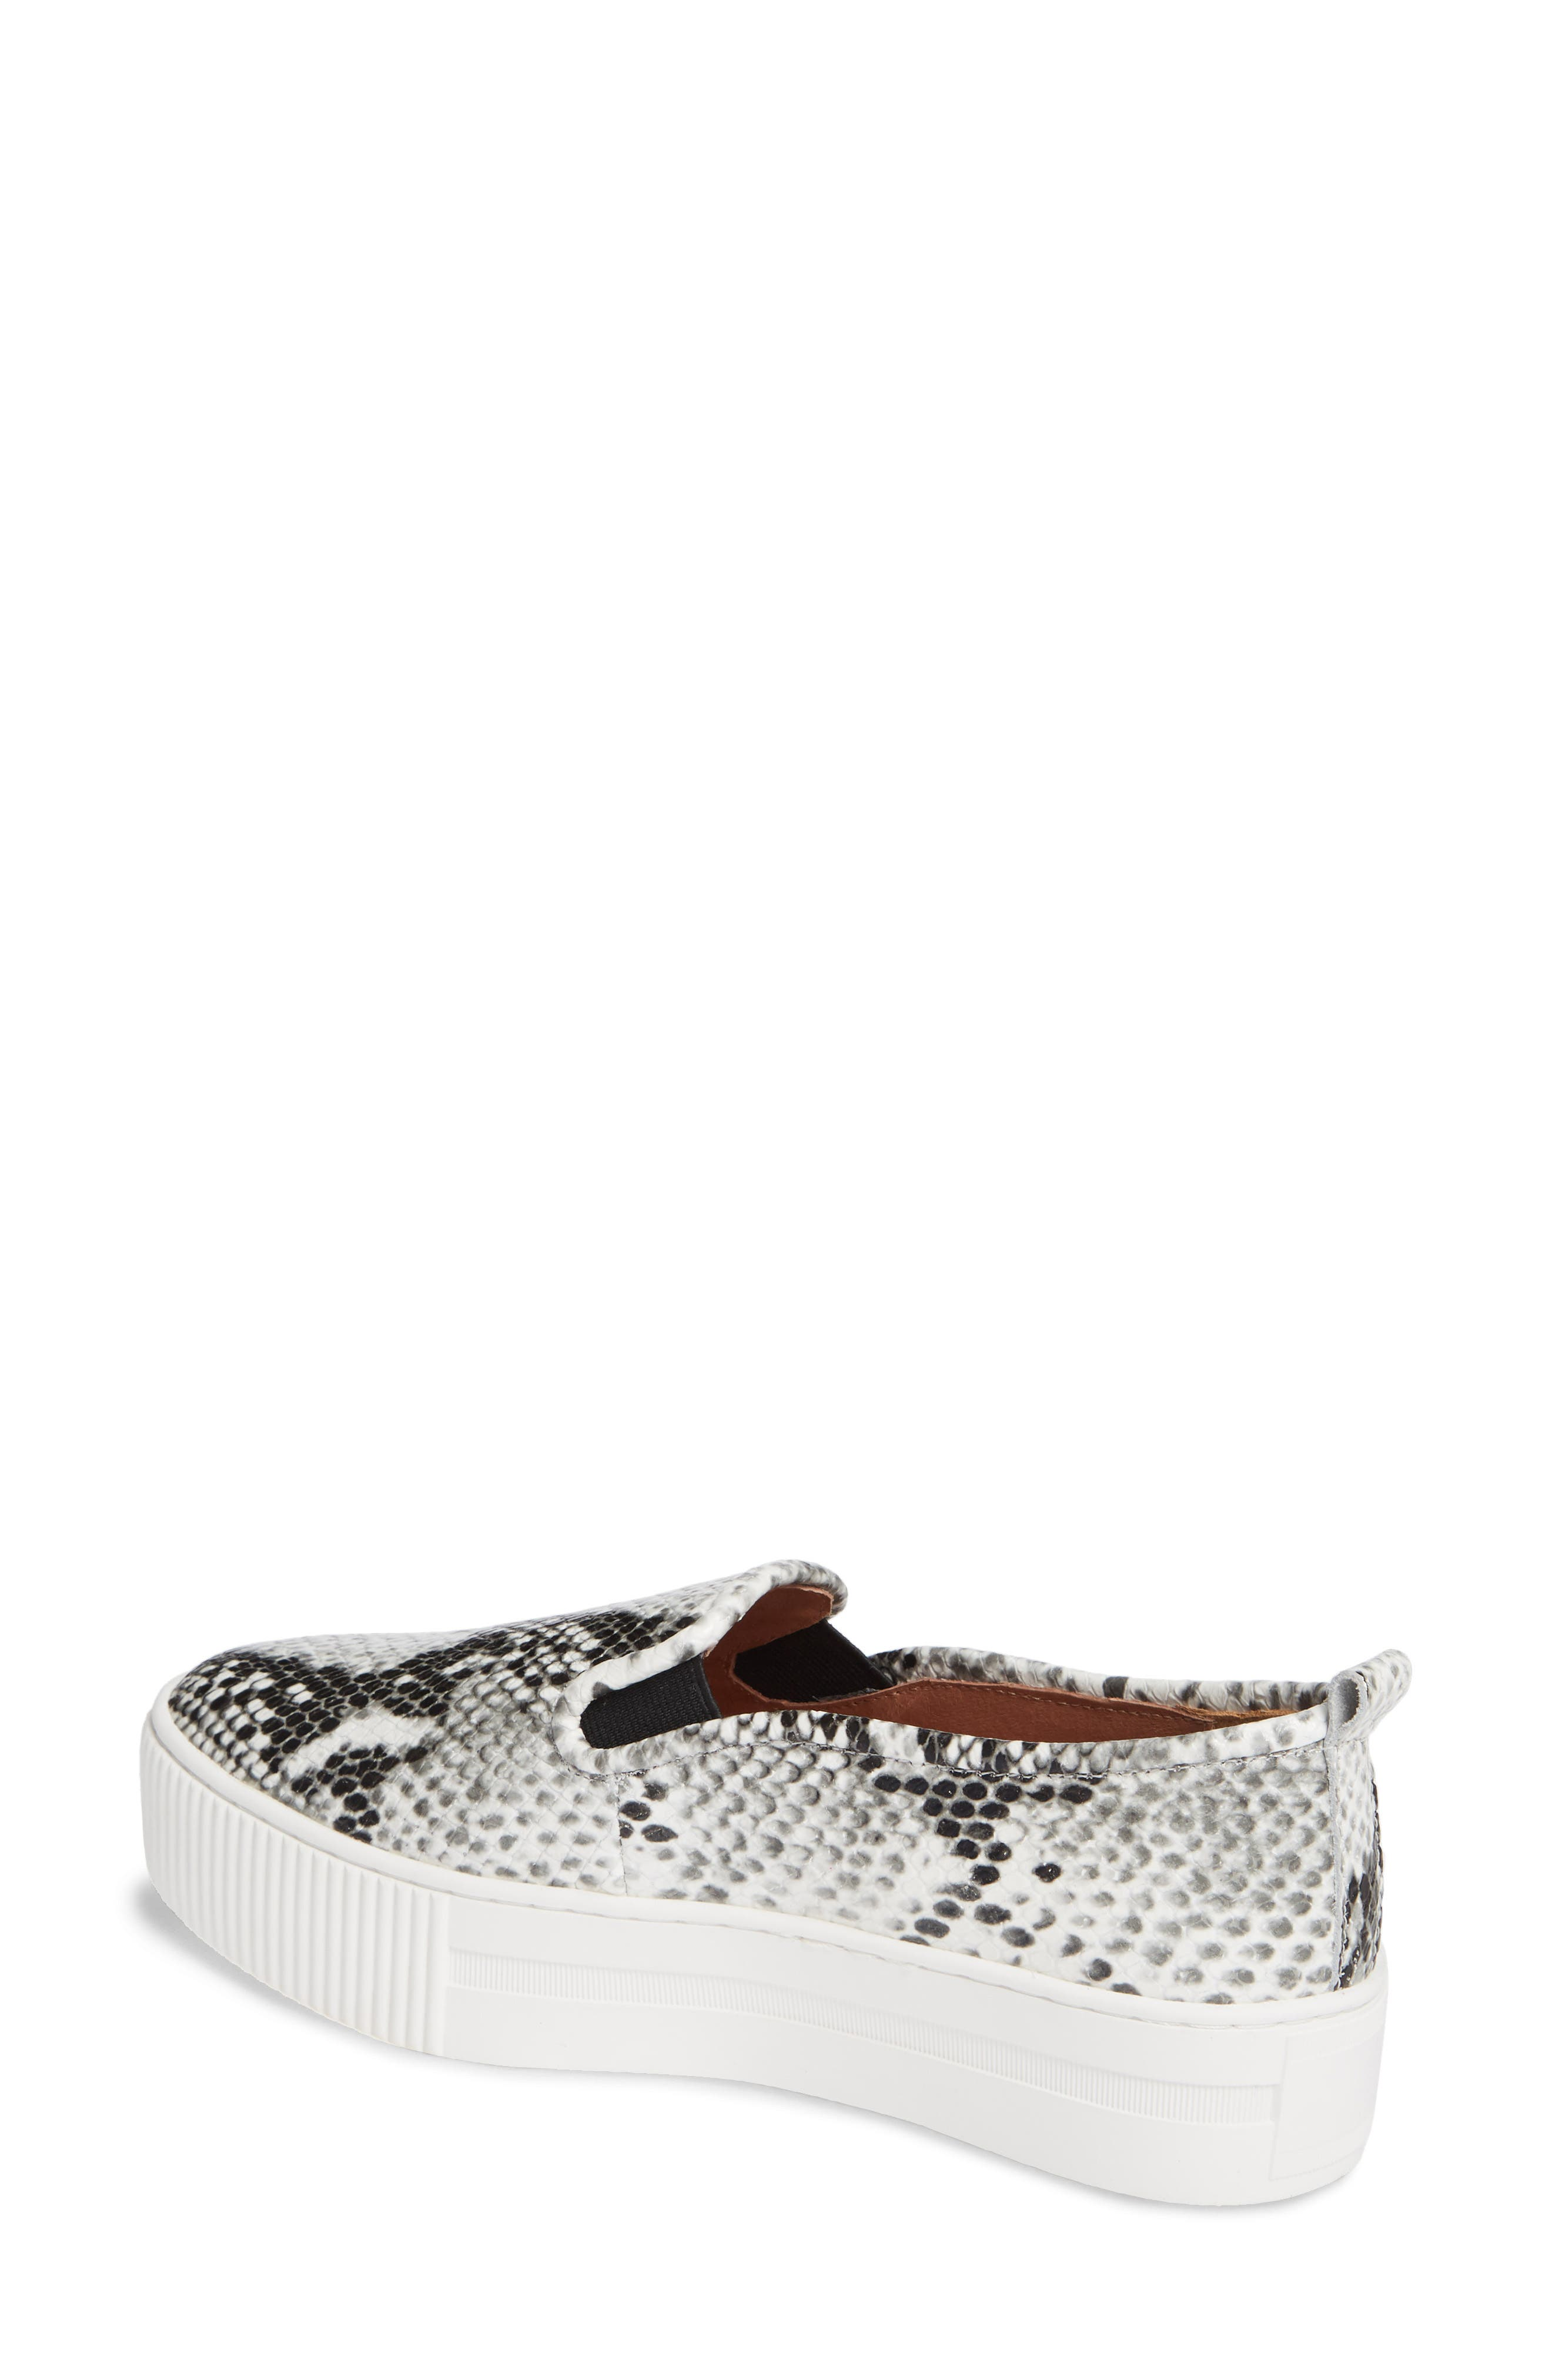 ,                             Baylee Platform Slip-On Sneaker,                             Alternate thumbnail 2, color,                             PYTHON PRINTED LEATHER